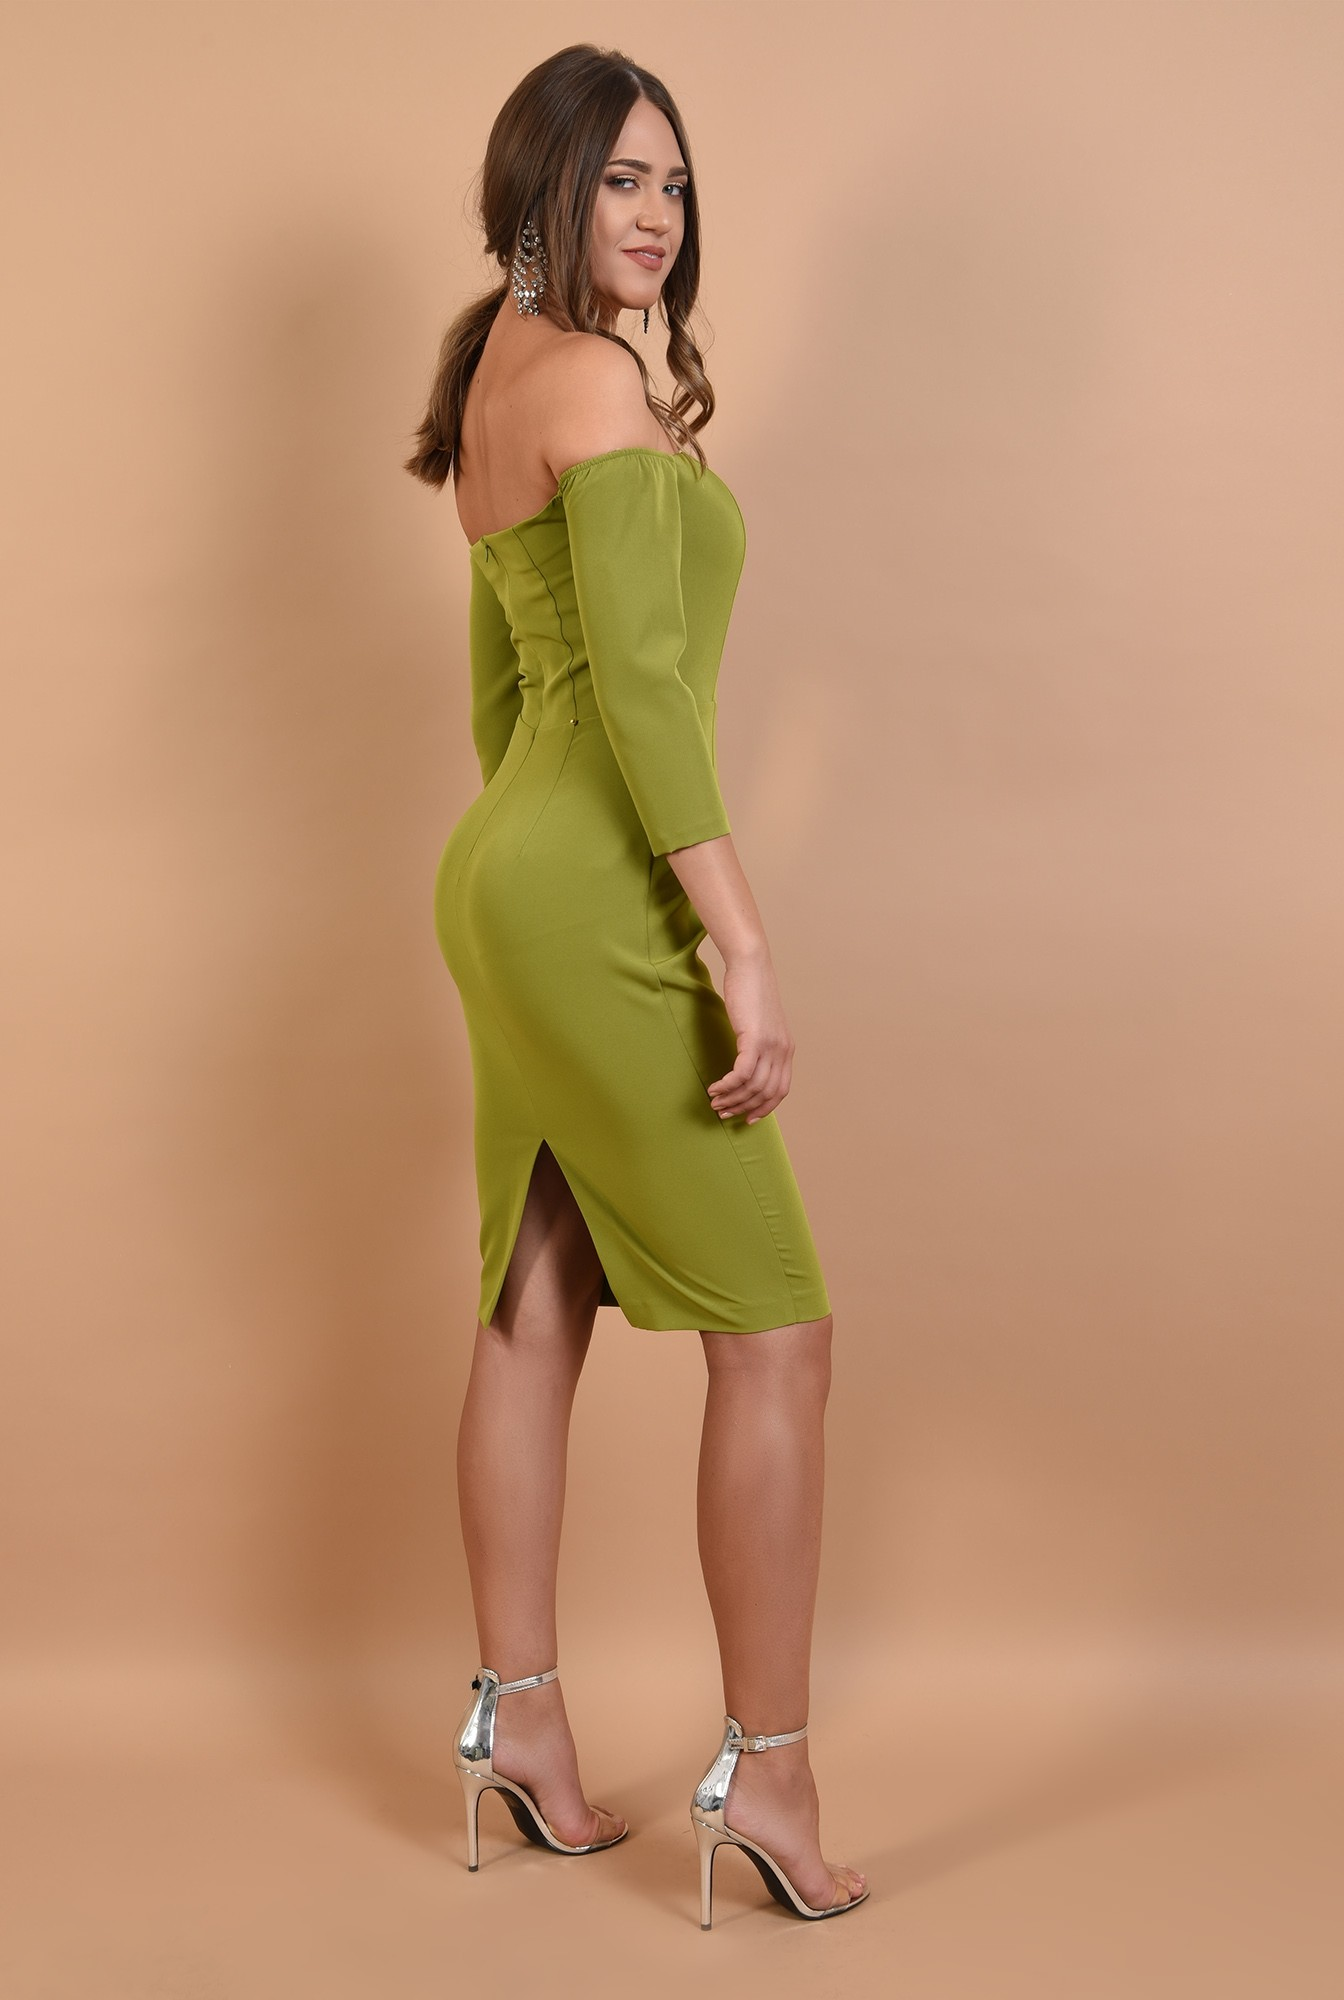 1 - rochie Poema, eleganta, cambrata, cu maneci ajustate, verde lime